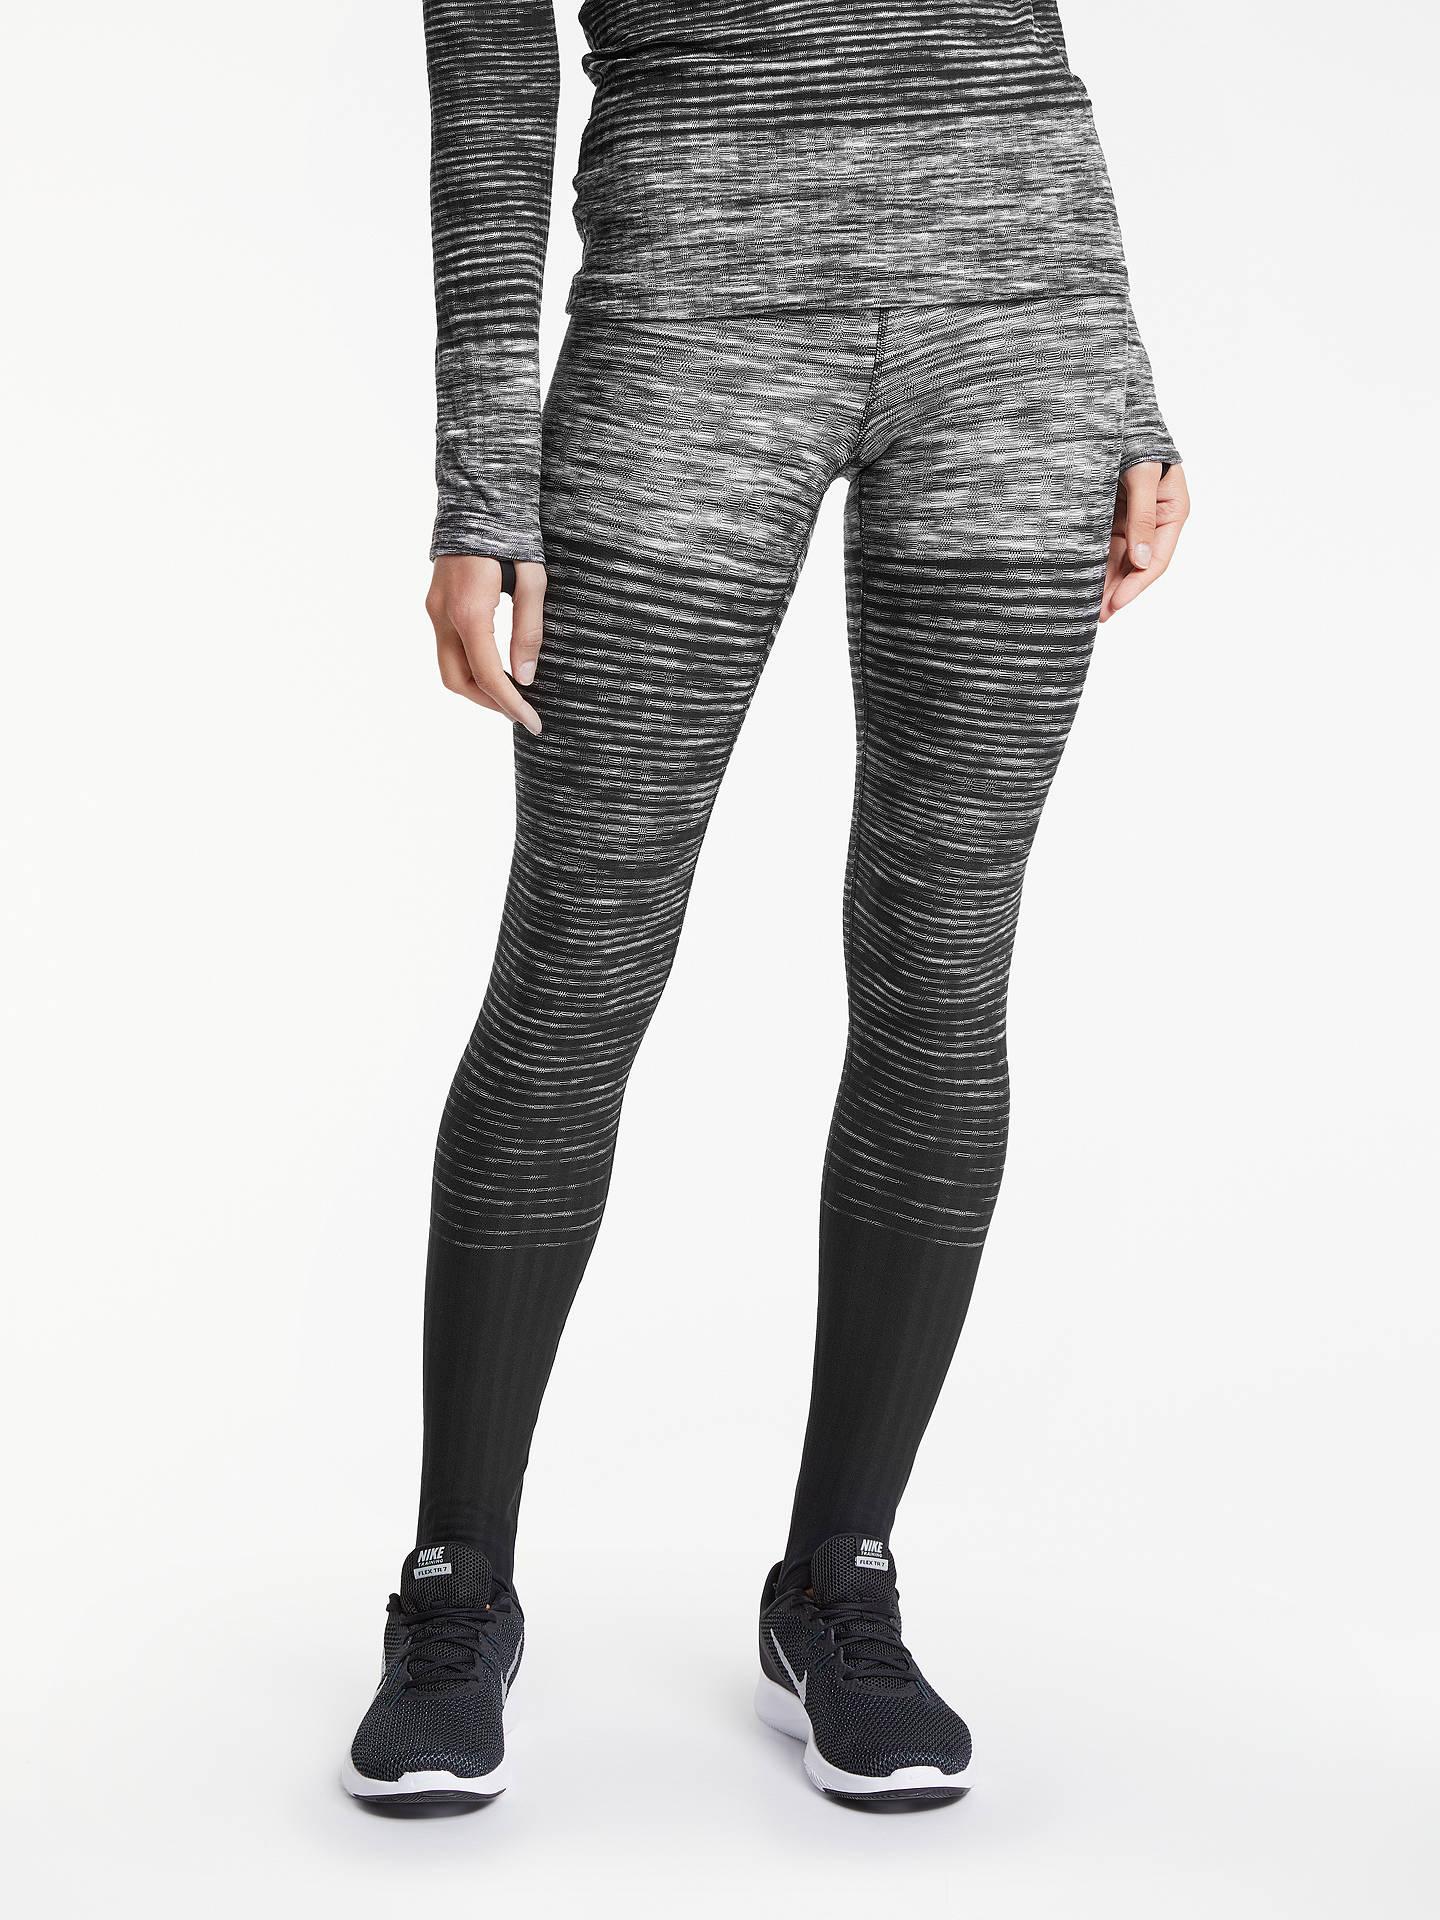 623dbbdf9a Buy Nike Pro Hyperwarm Training Tights, Dark Grey/White, XS Online at  johnlewis ...